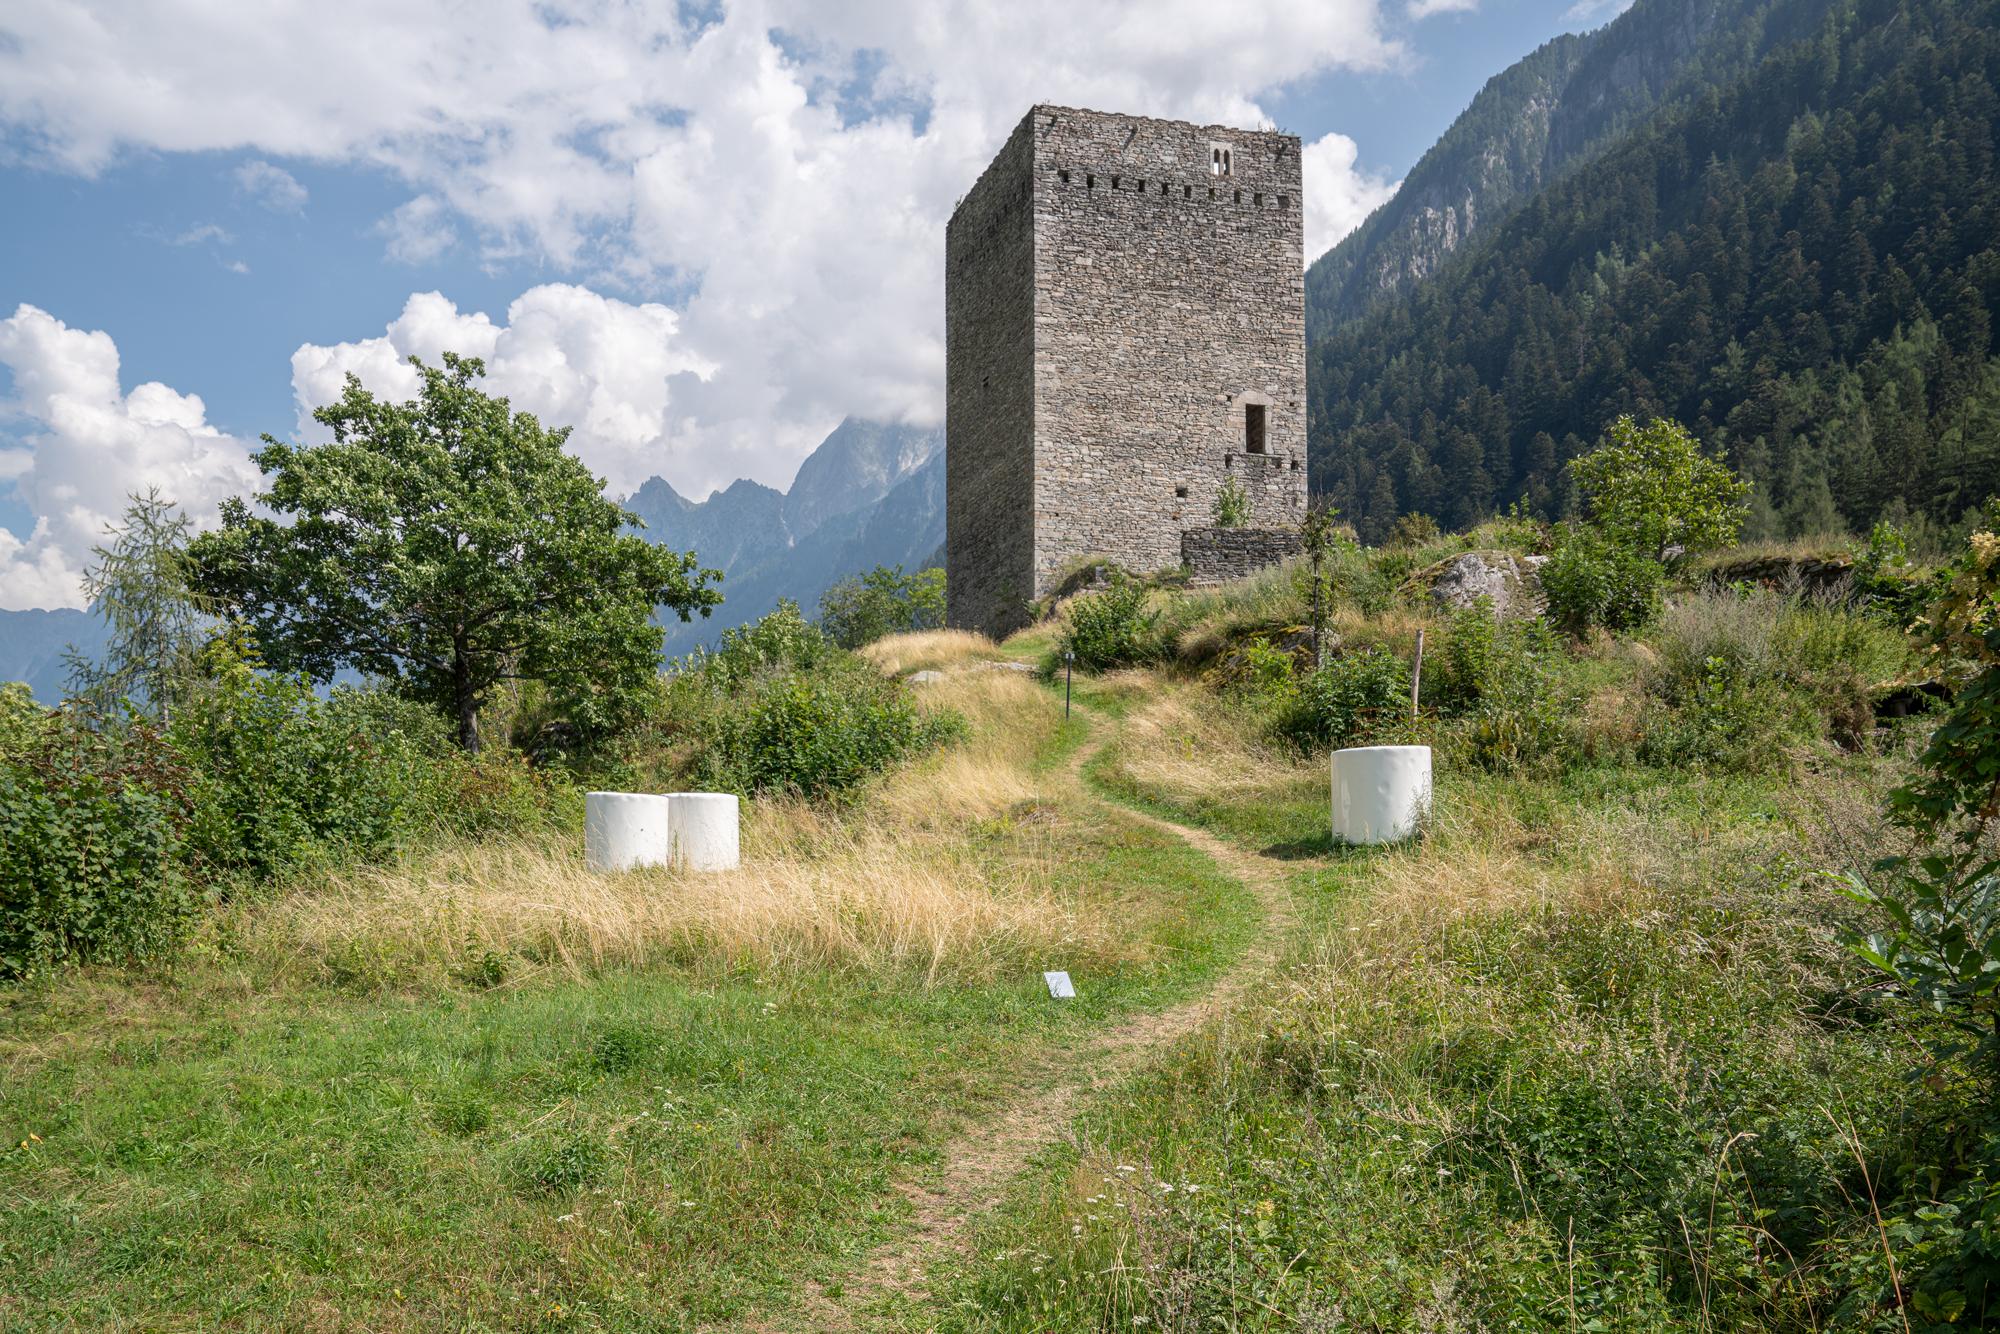 Biennale Bregaglia 2020 – Not Vital, Bale, 2018; Bild © Yanik Bürkli, CLUS AG